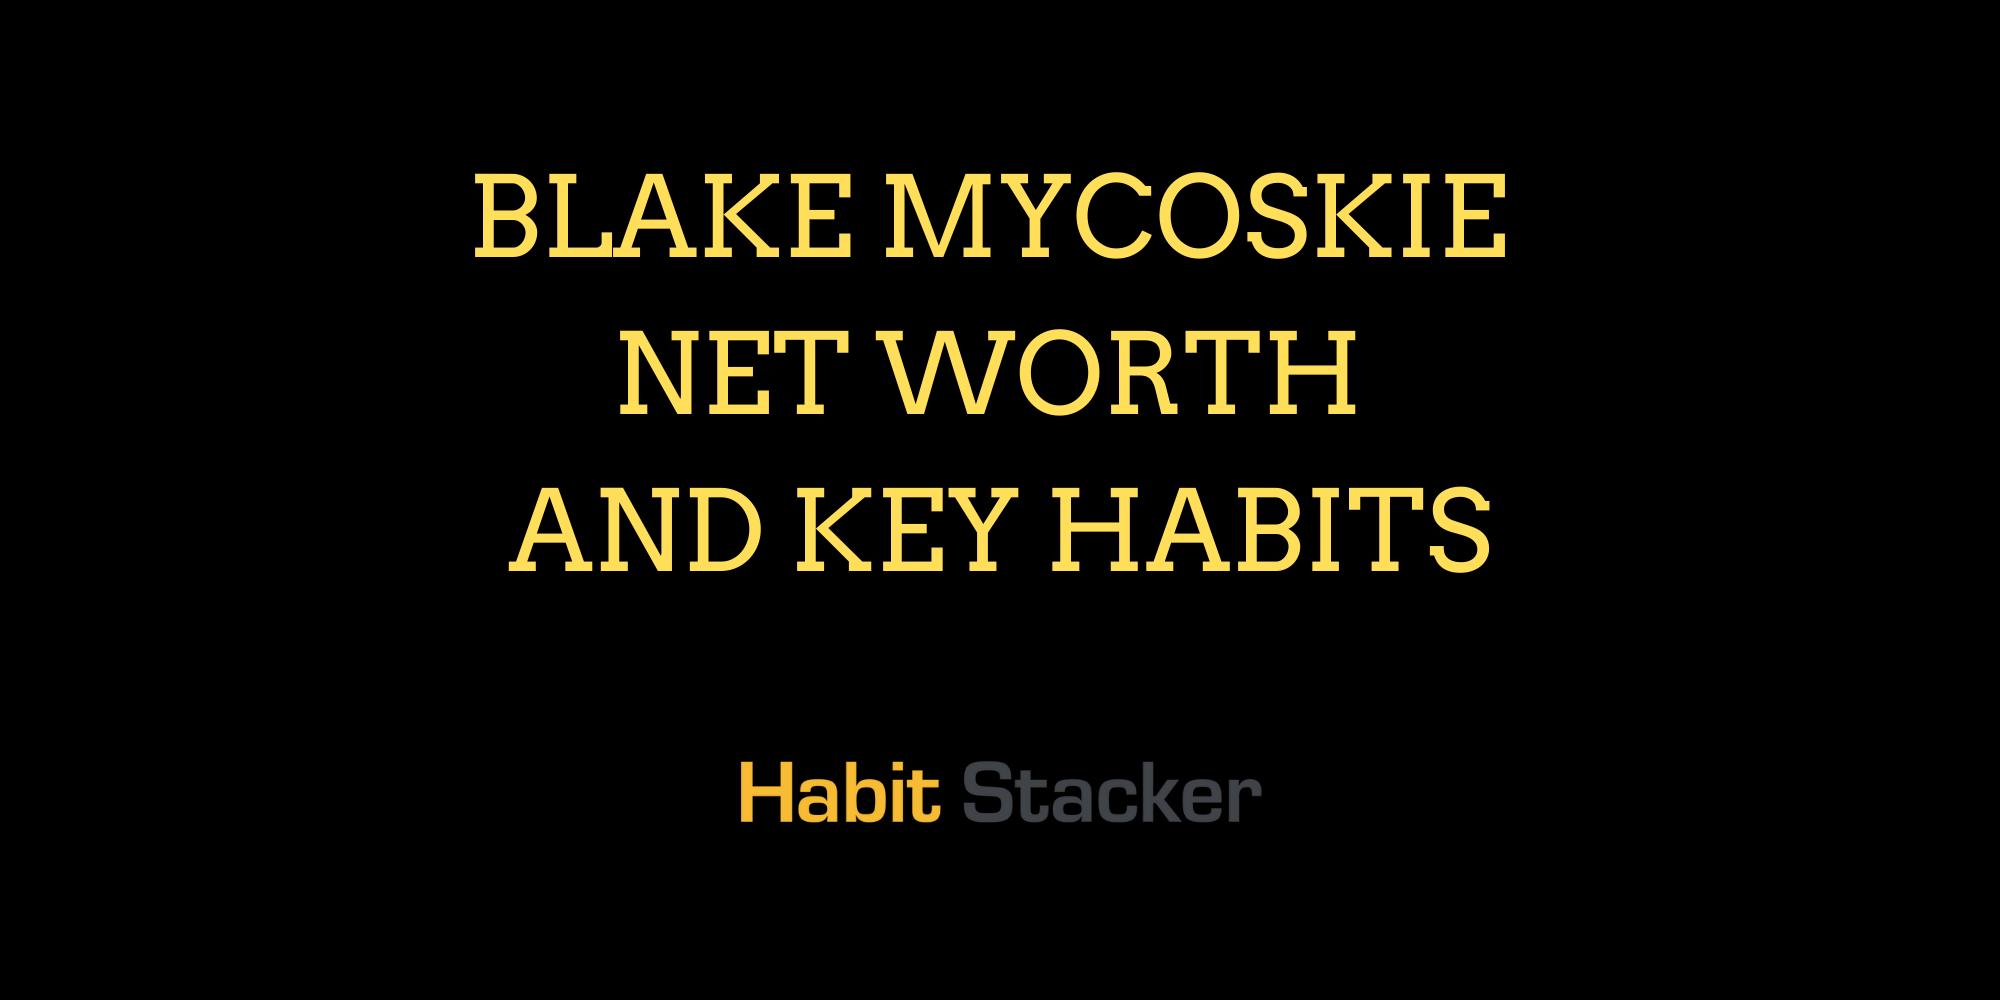 Blake Mycoskie Net Worth and Key Habits